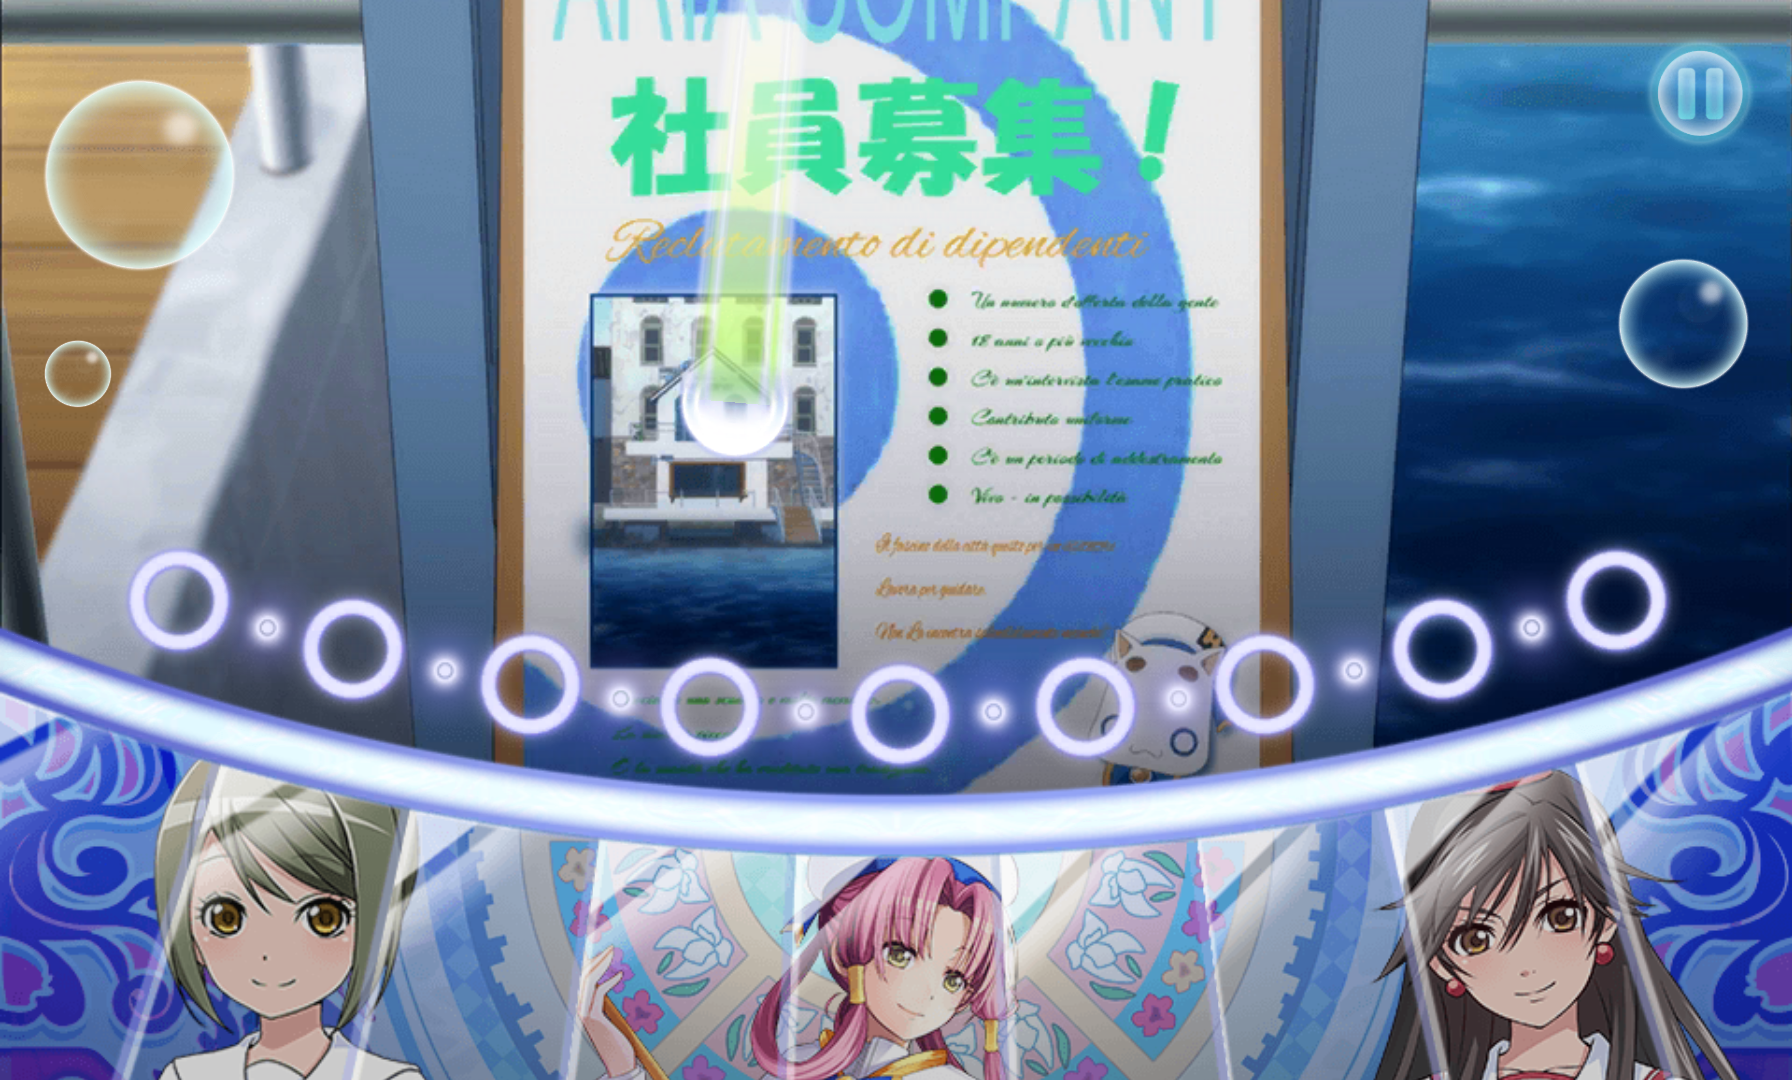 androidアプリ ARIA 〜AQUA RITMO〜攻略スクリーンショット4